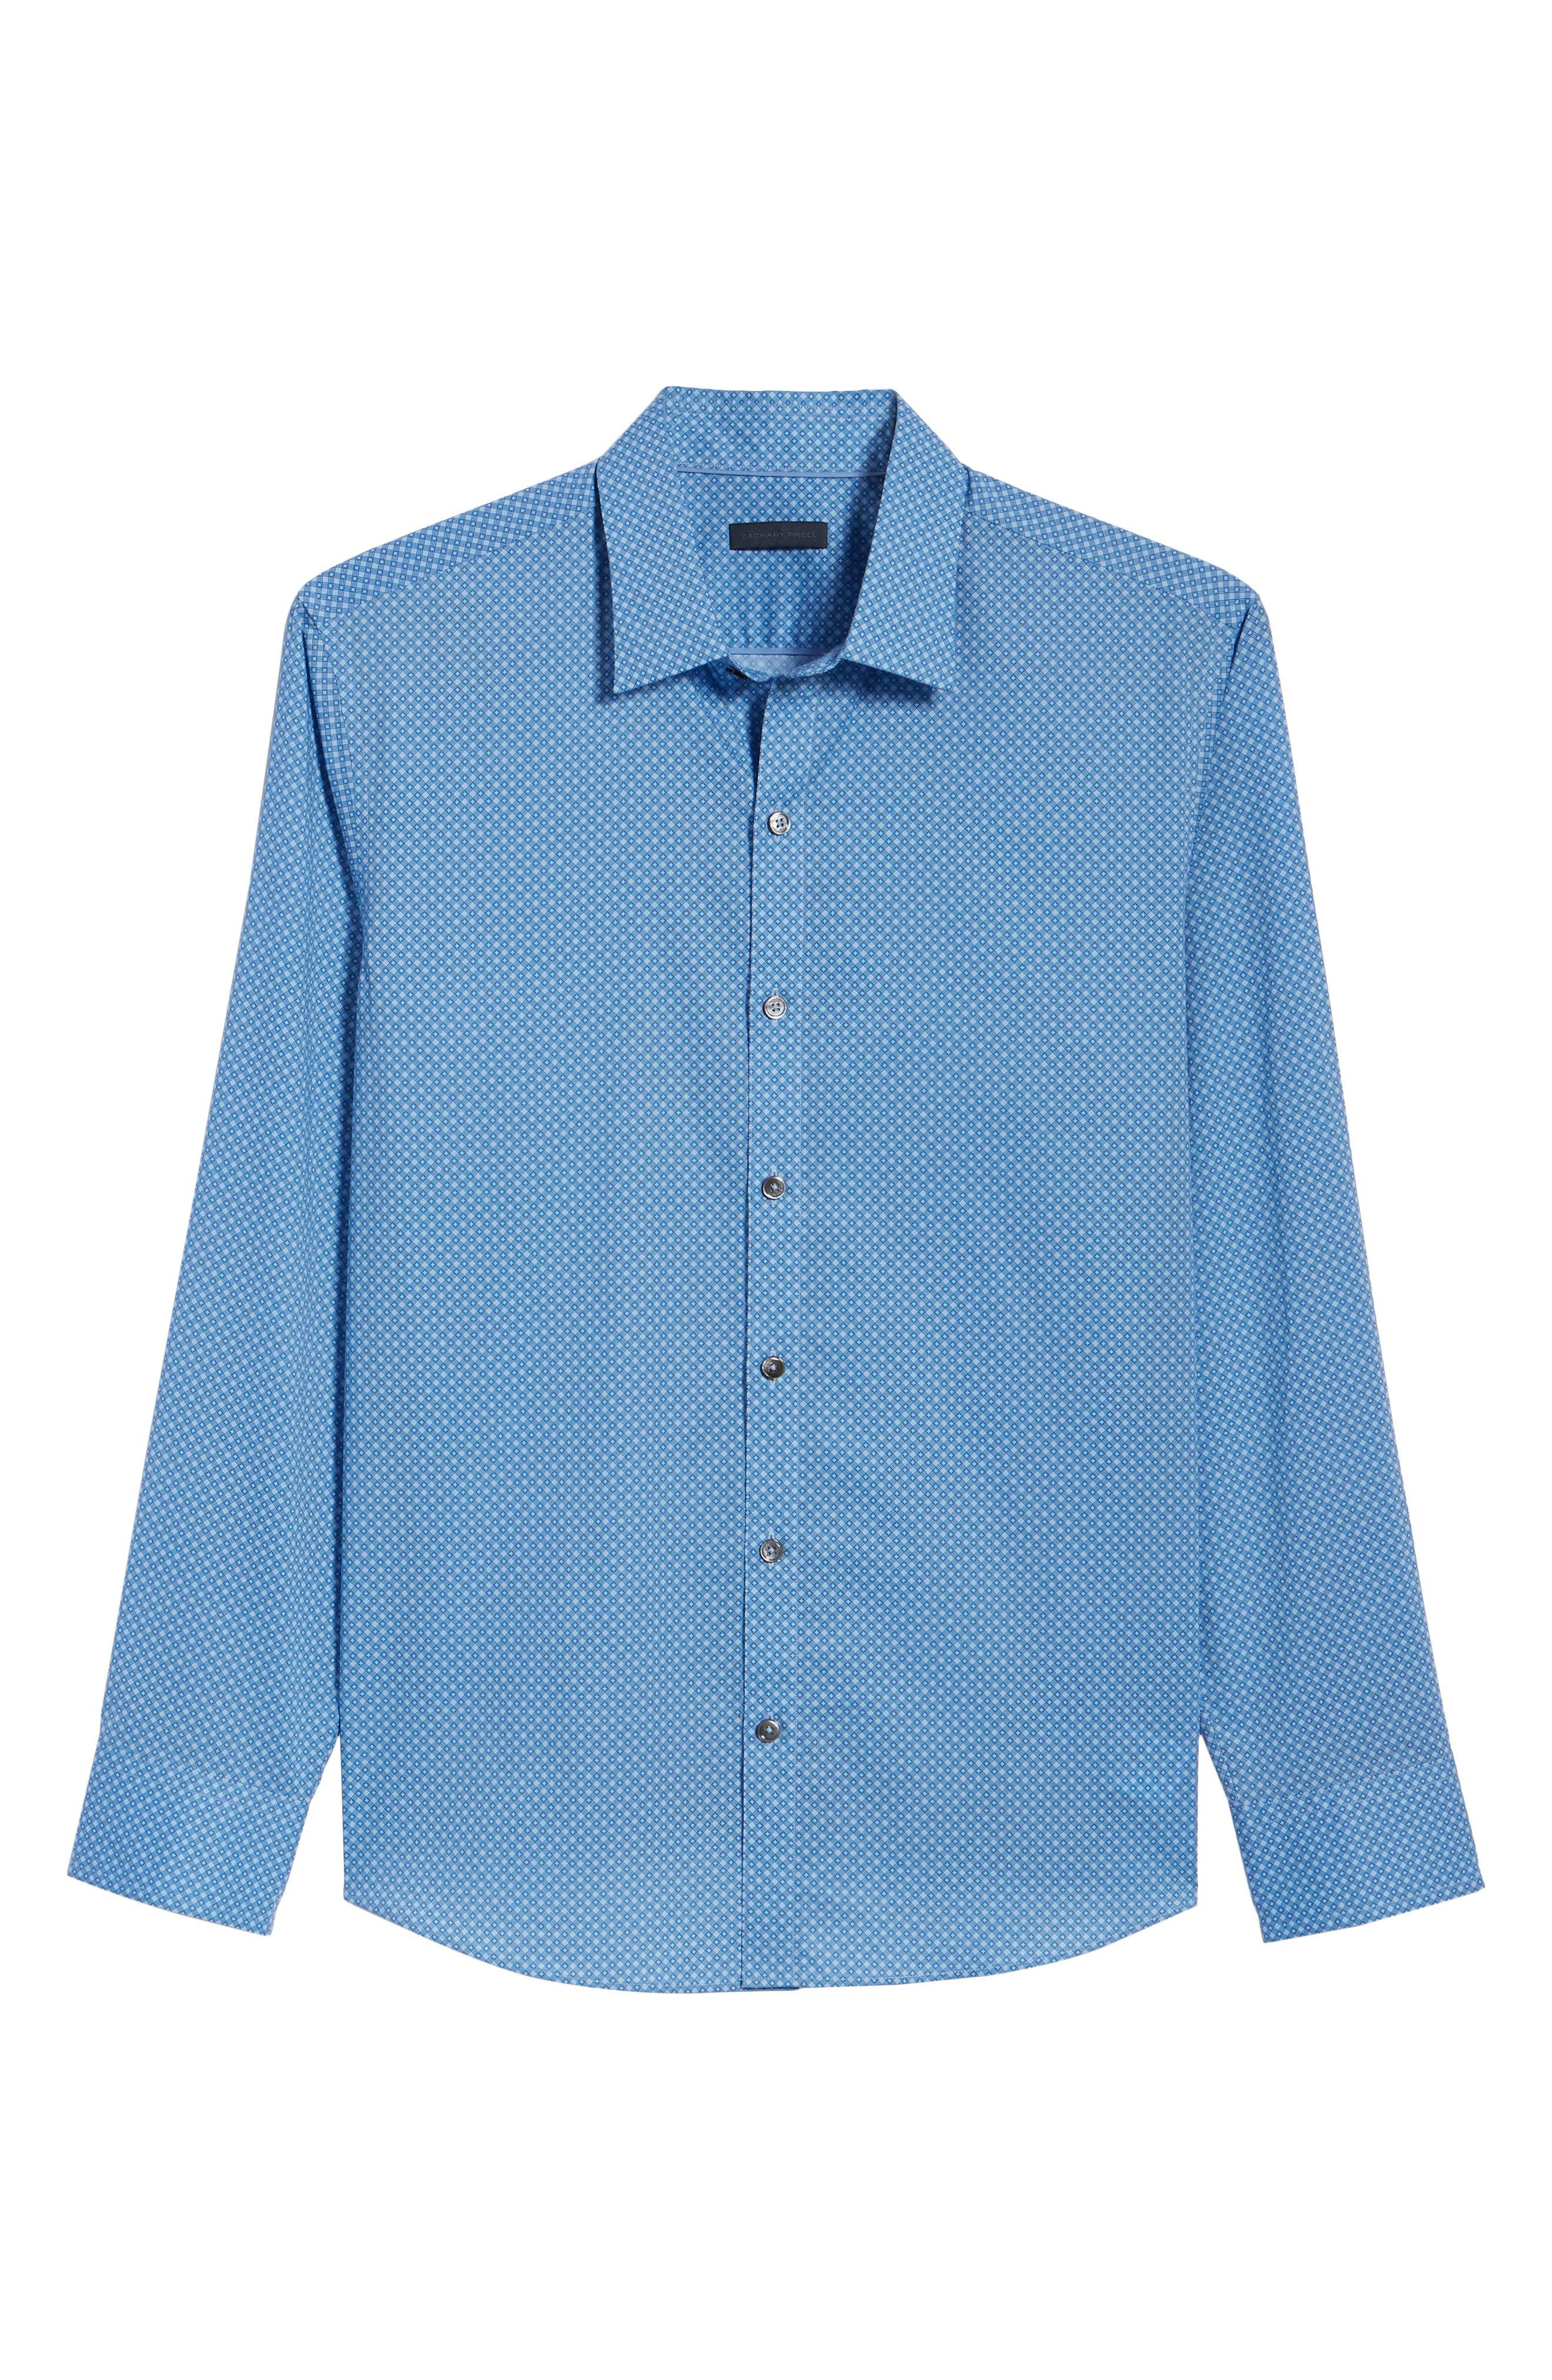 Ethan Slim Fit Sport Shirt,                             Alternate thumbnail 6, color,                             400